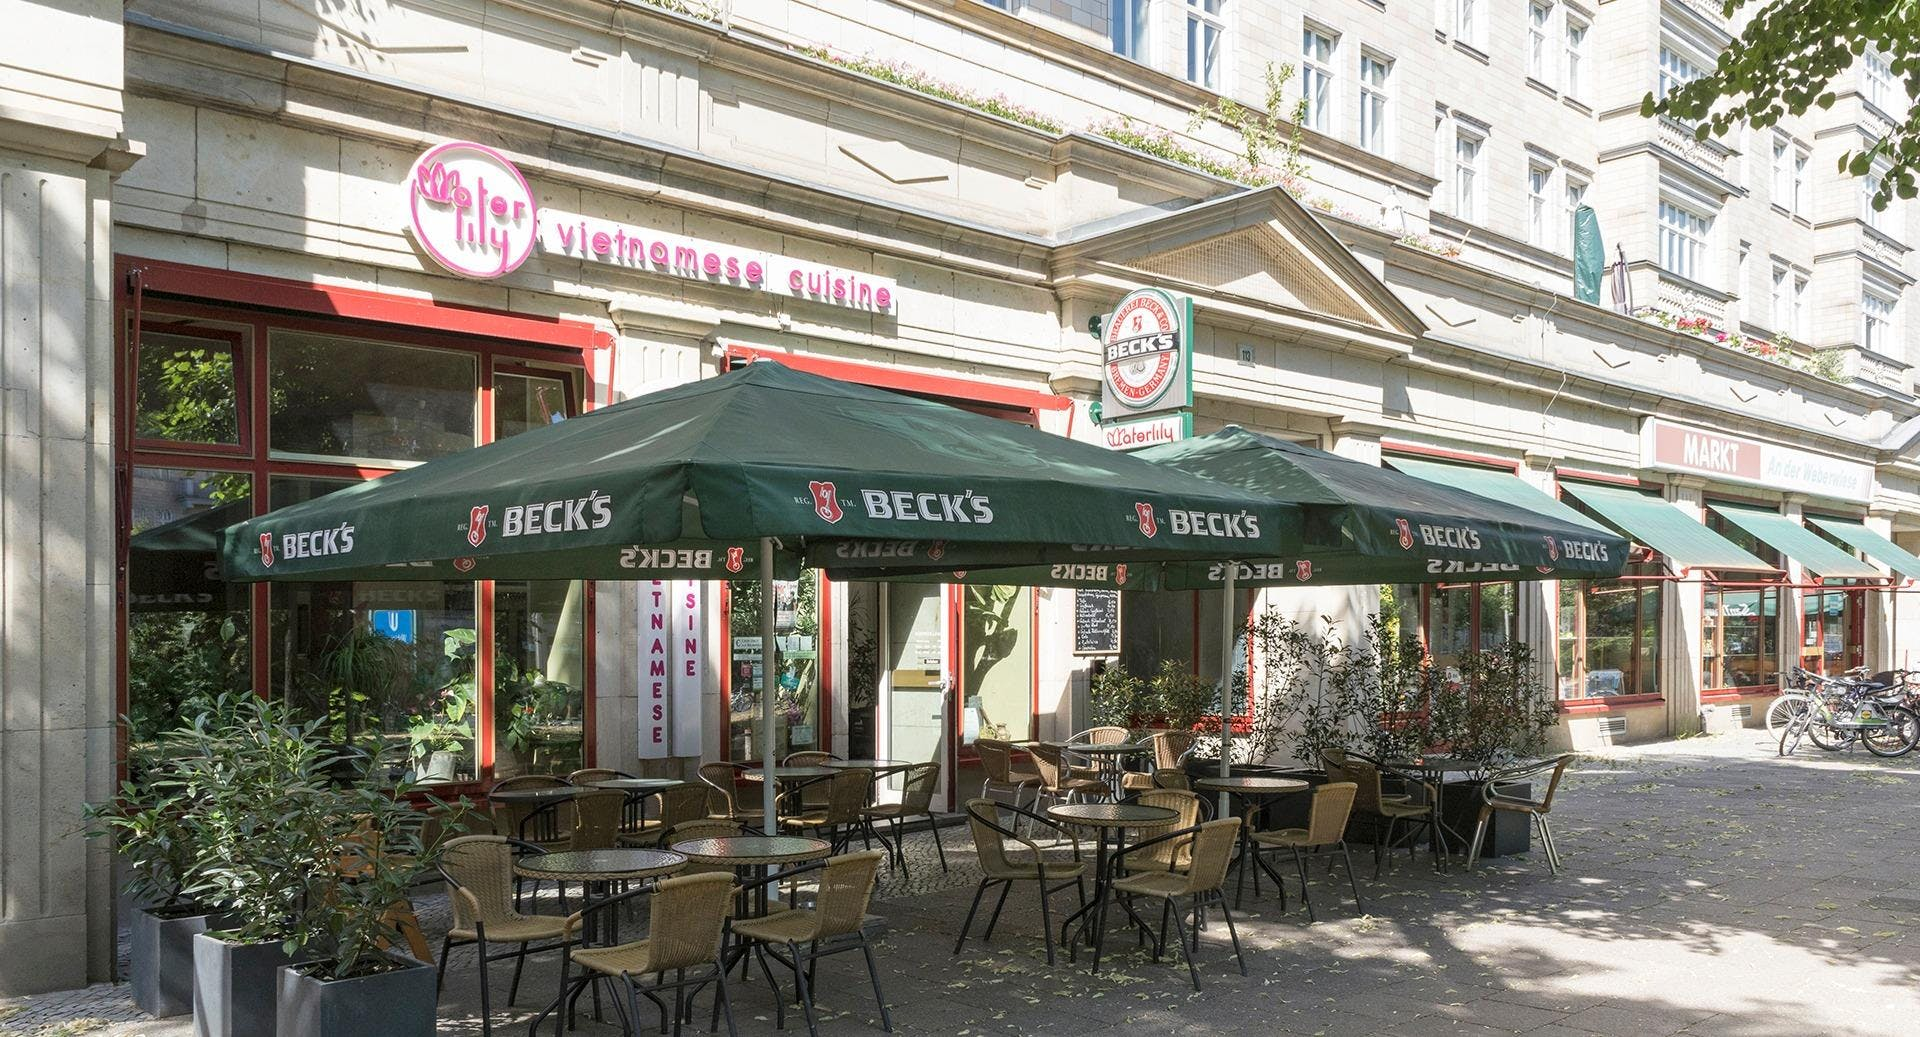 Waterlily Berlin image 2